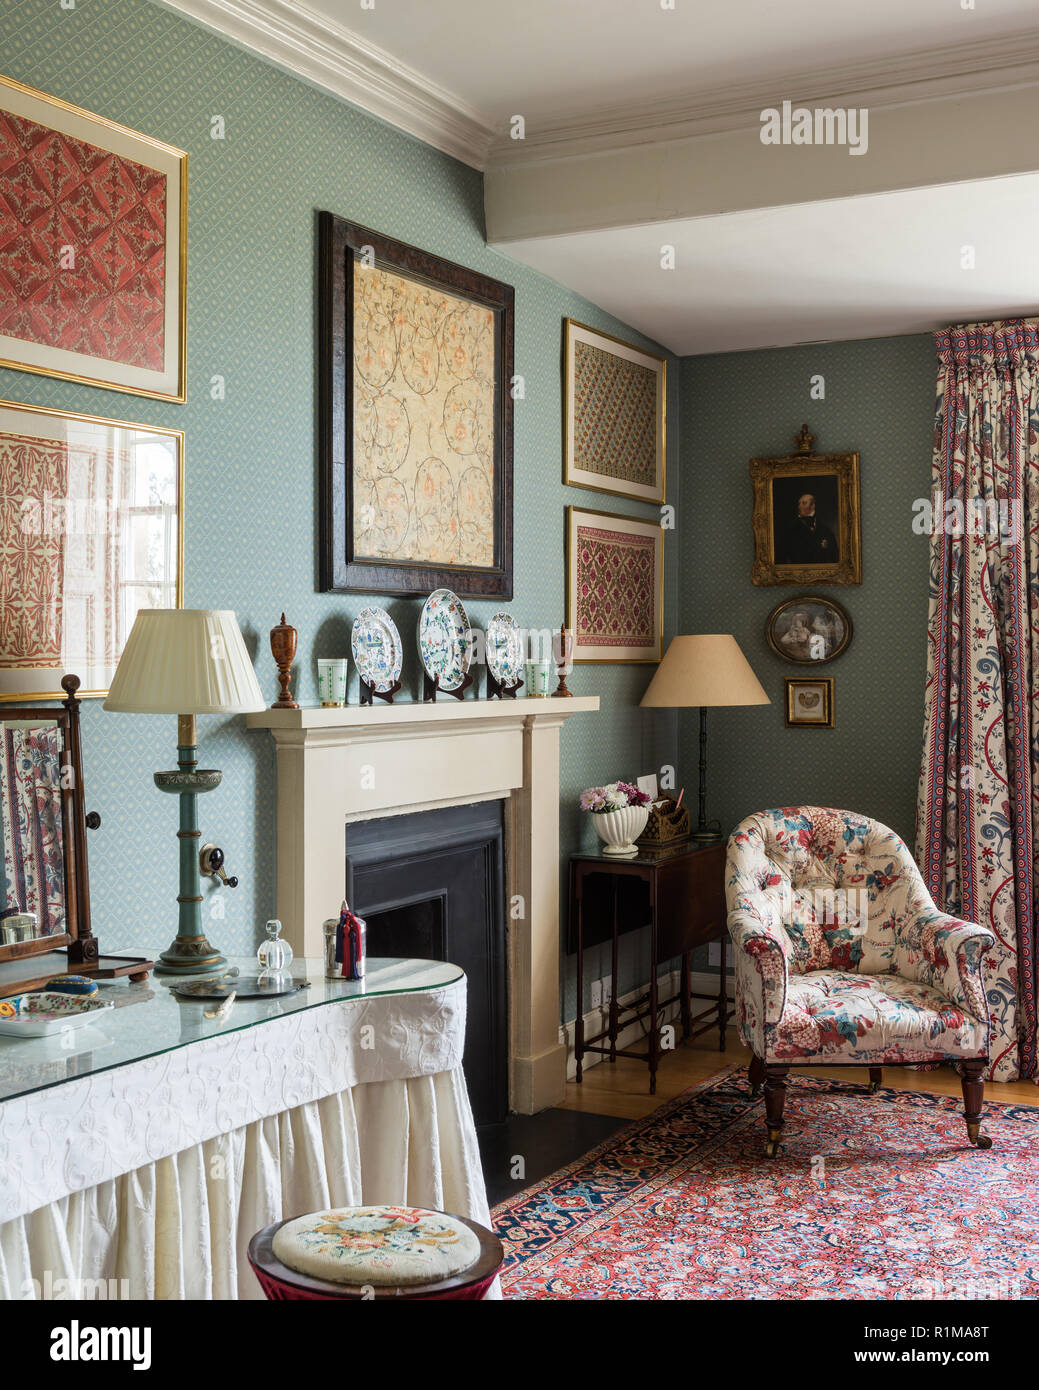 Fireplace in Edwardian bedroom - Stock Image